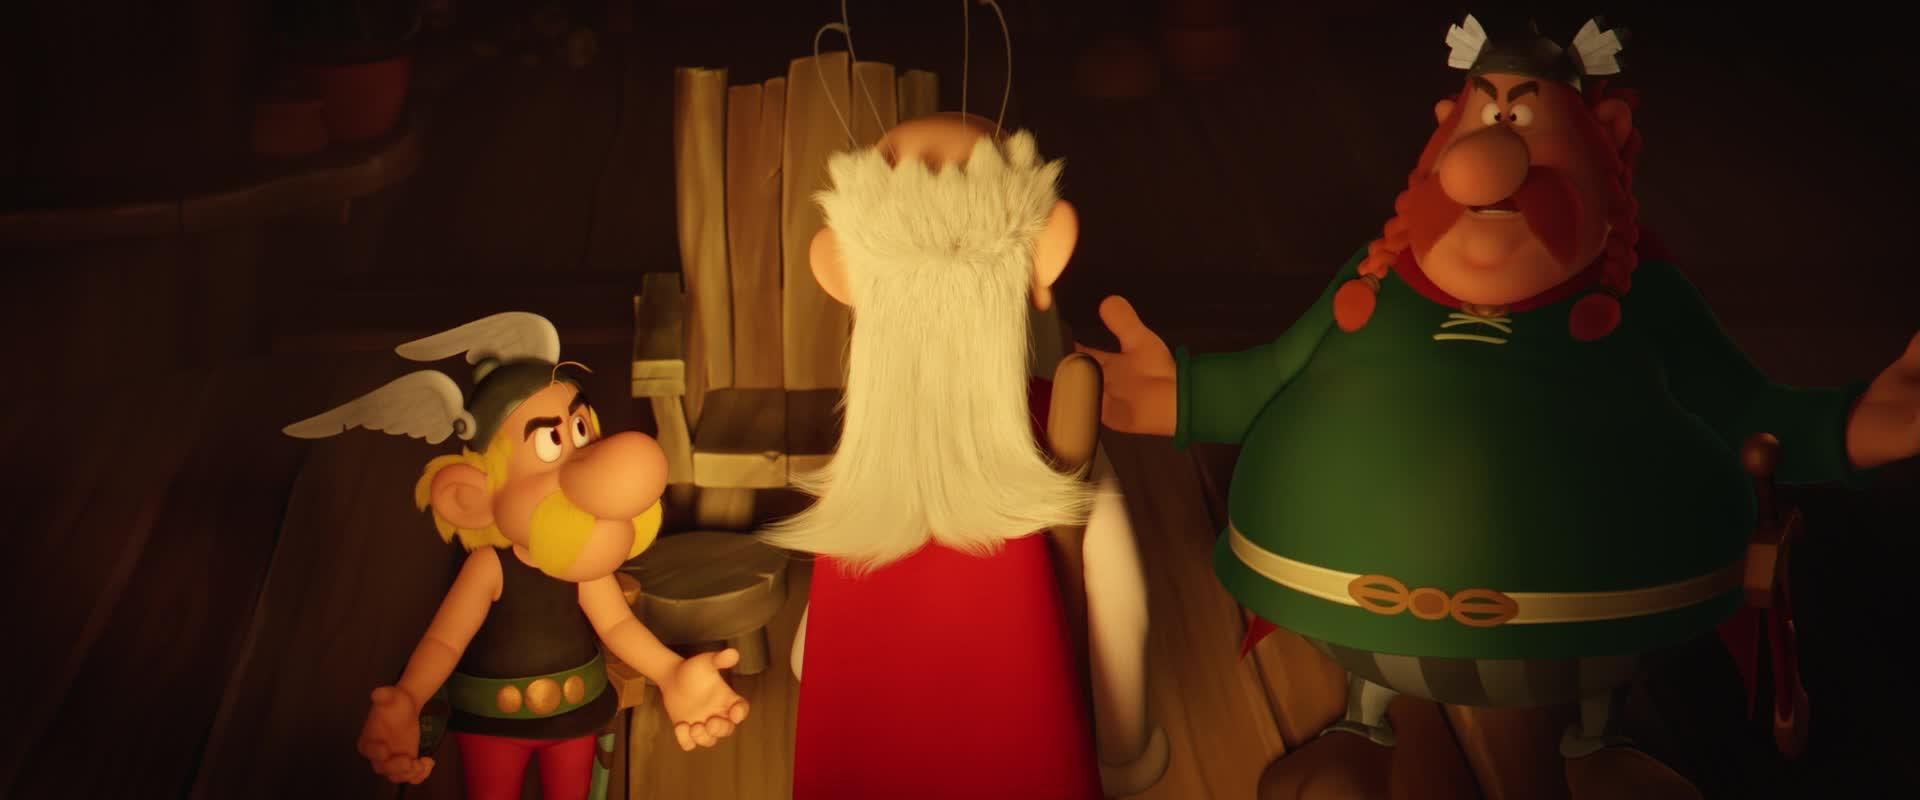 Asterix a tajemstvi kouzelneho lektvaru 2018 CZ dabing HD